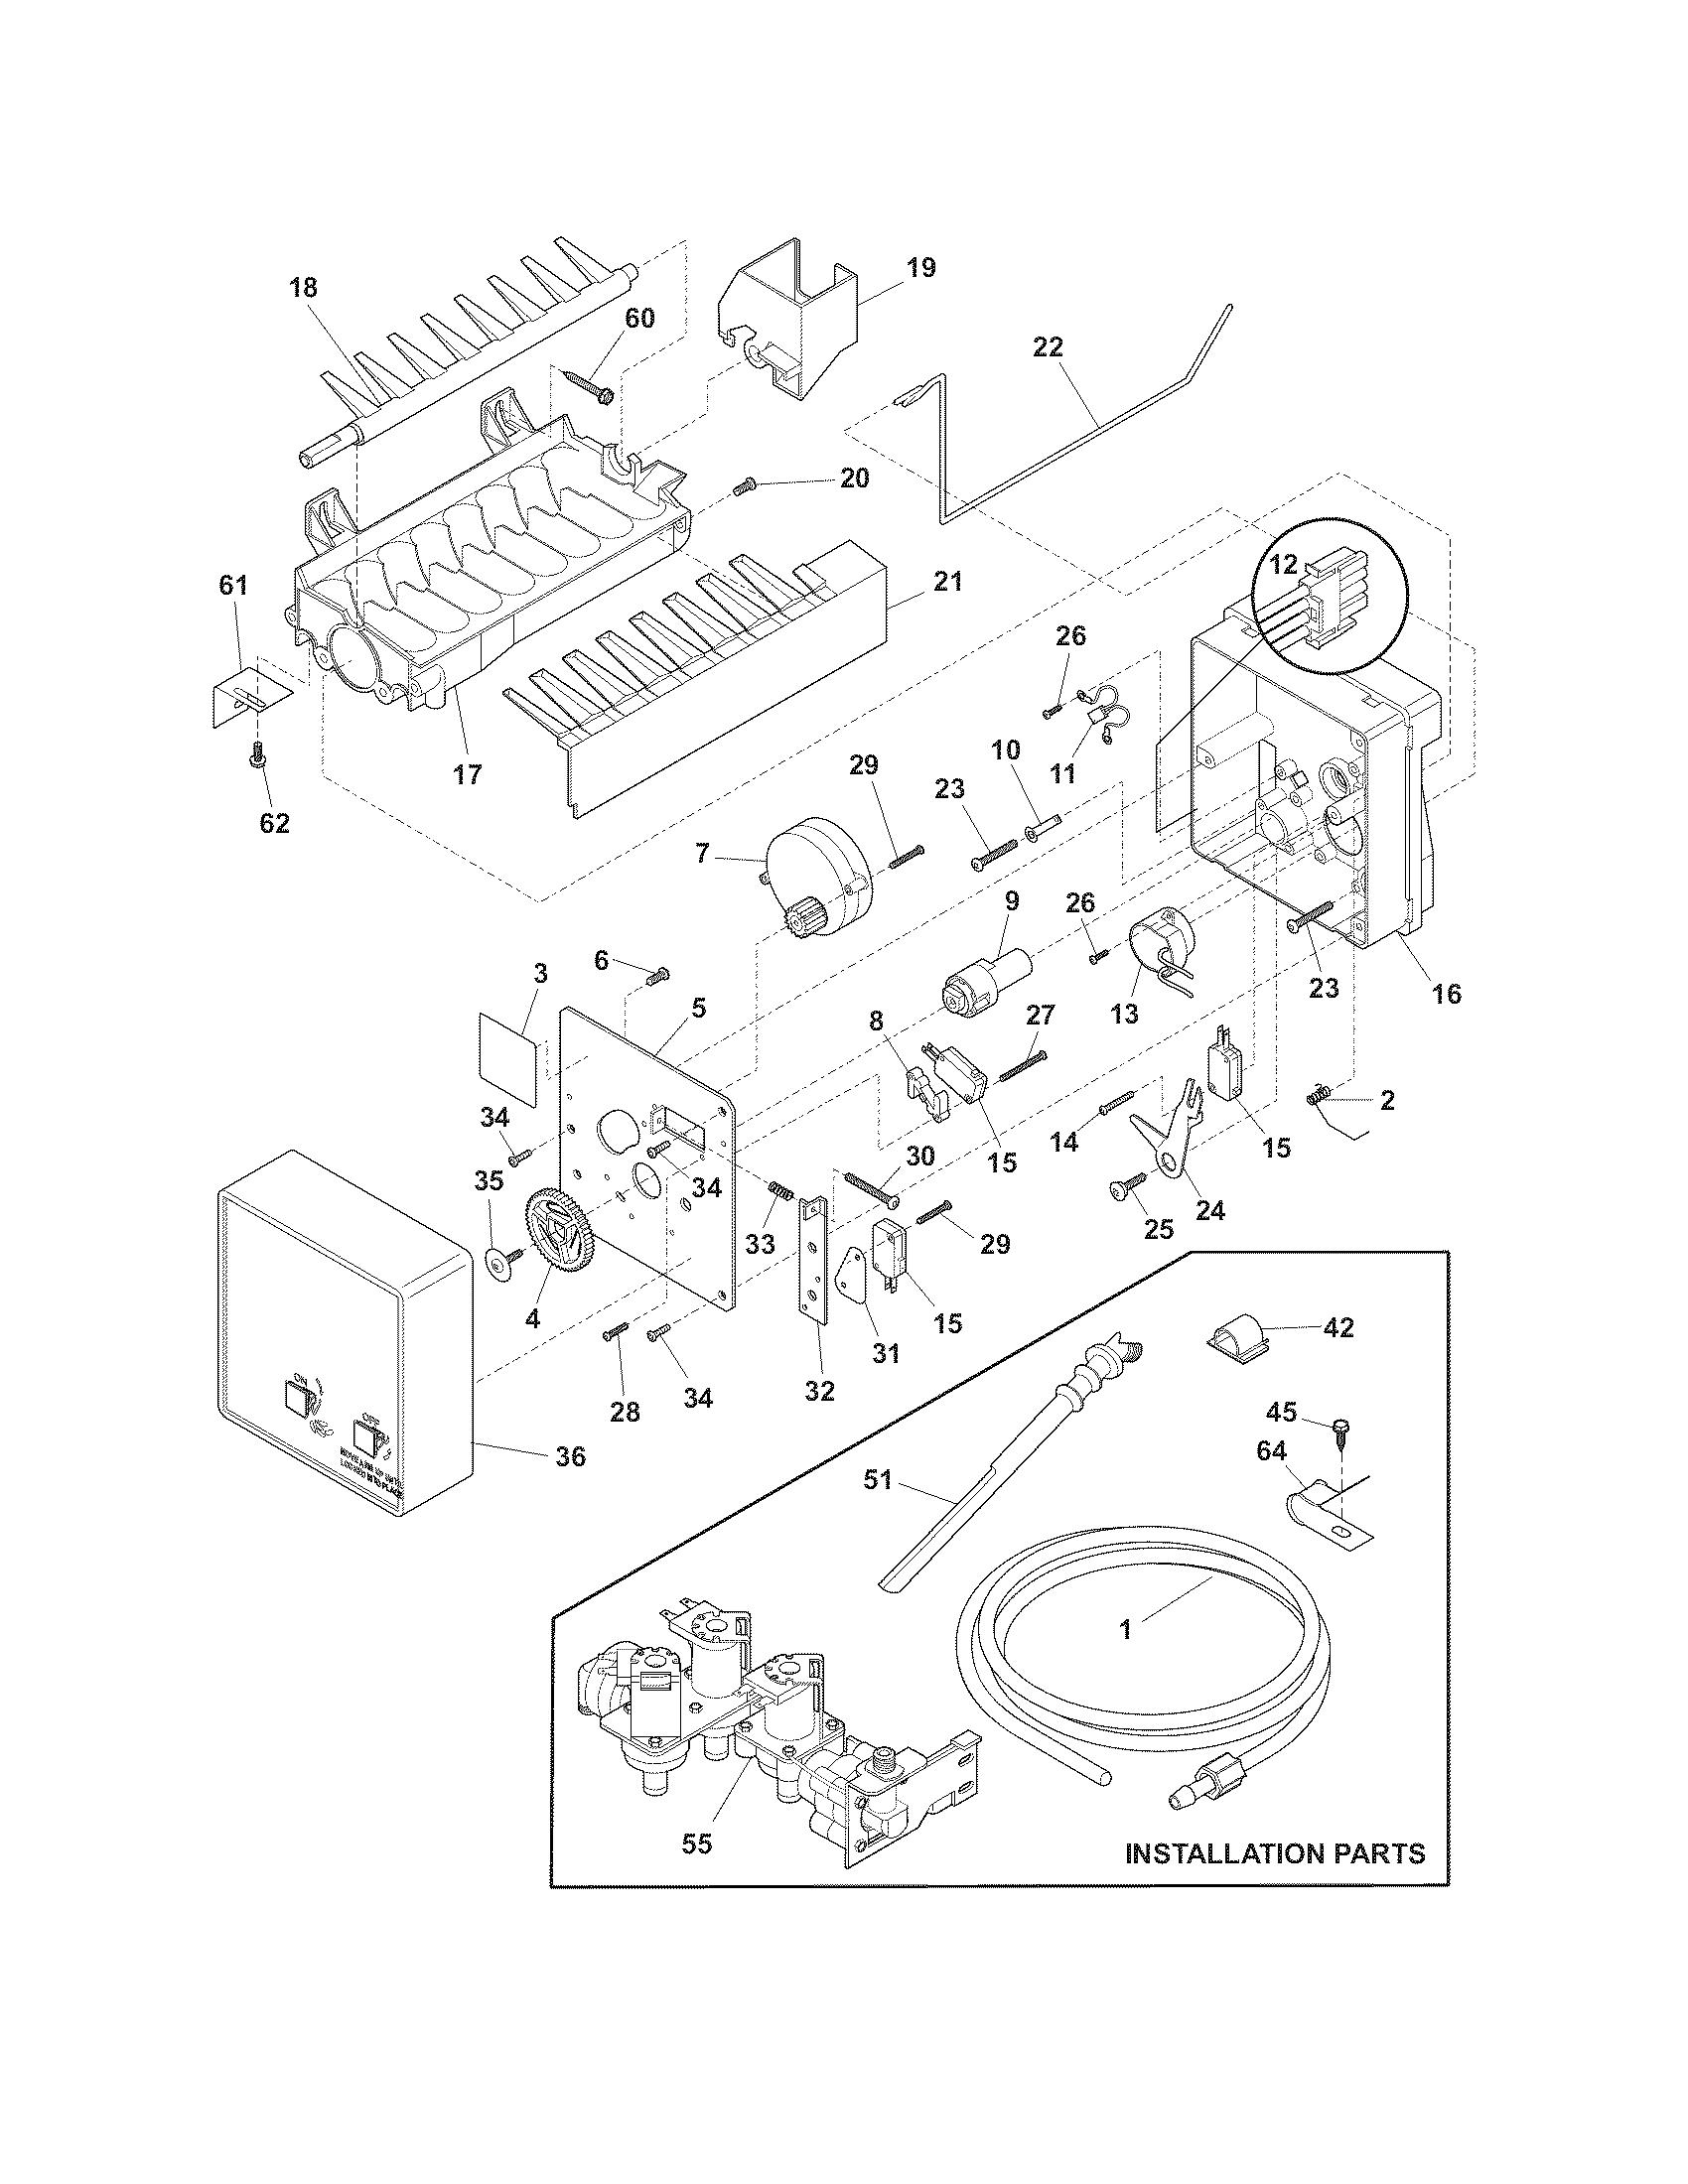 ice maker diagram whelen wig wag wiring frigidaire refrigerator parts model ffhs2622msf sears